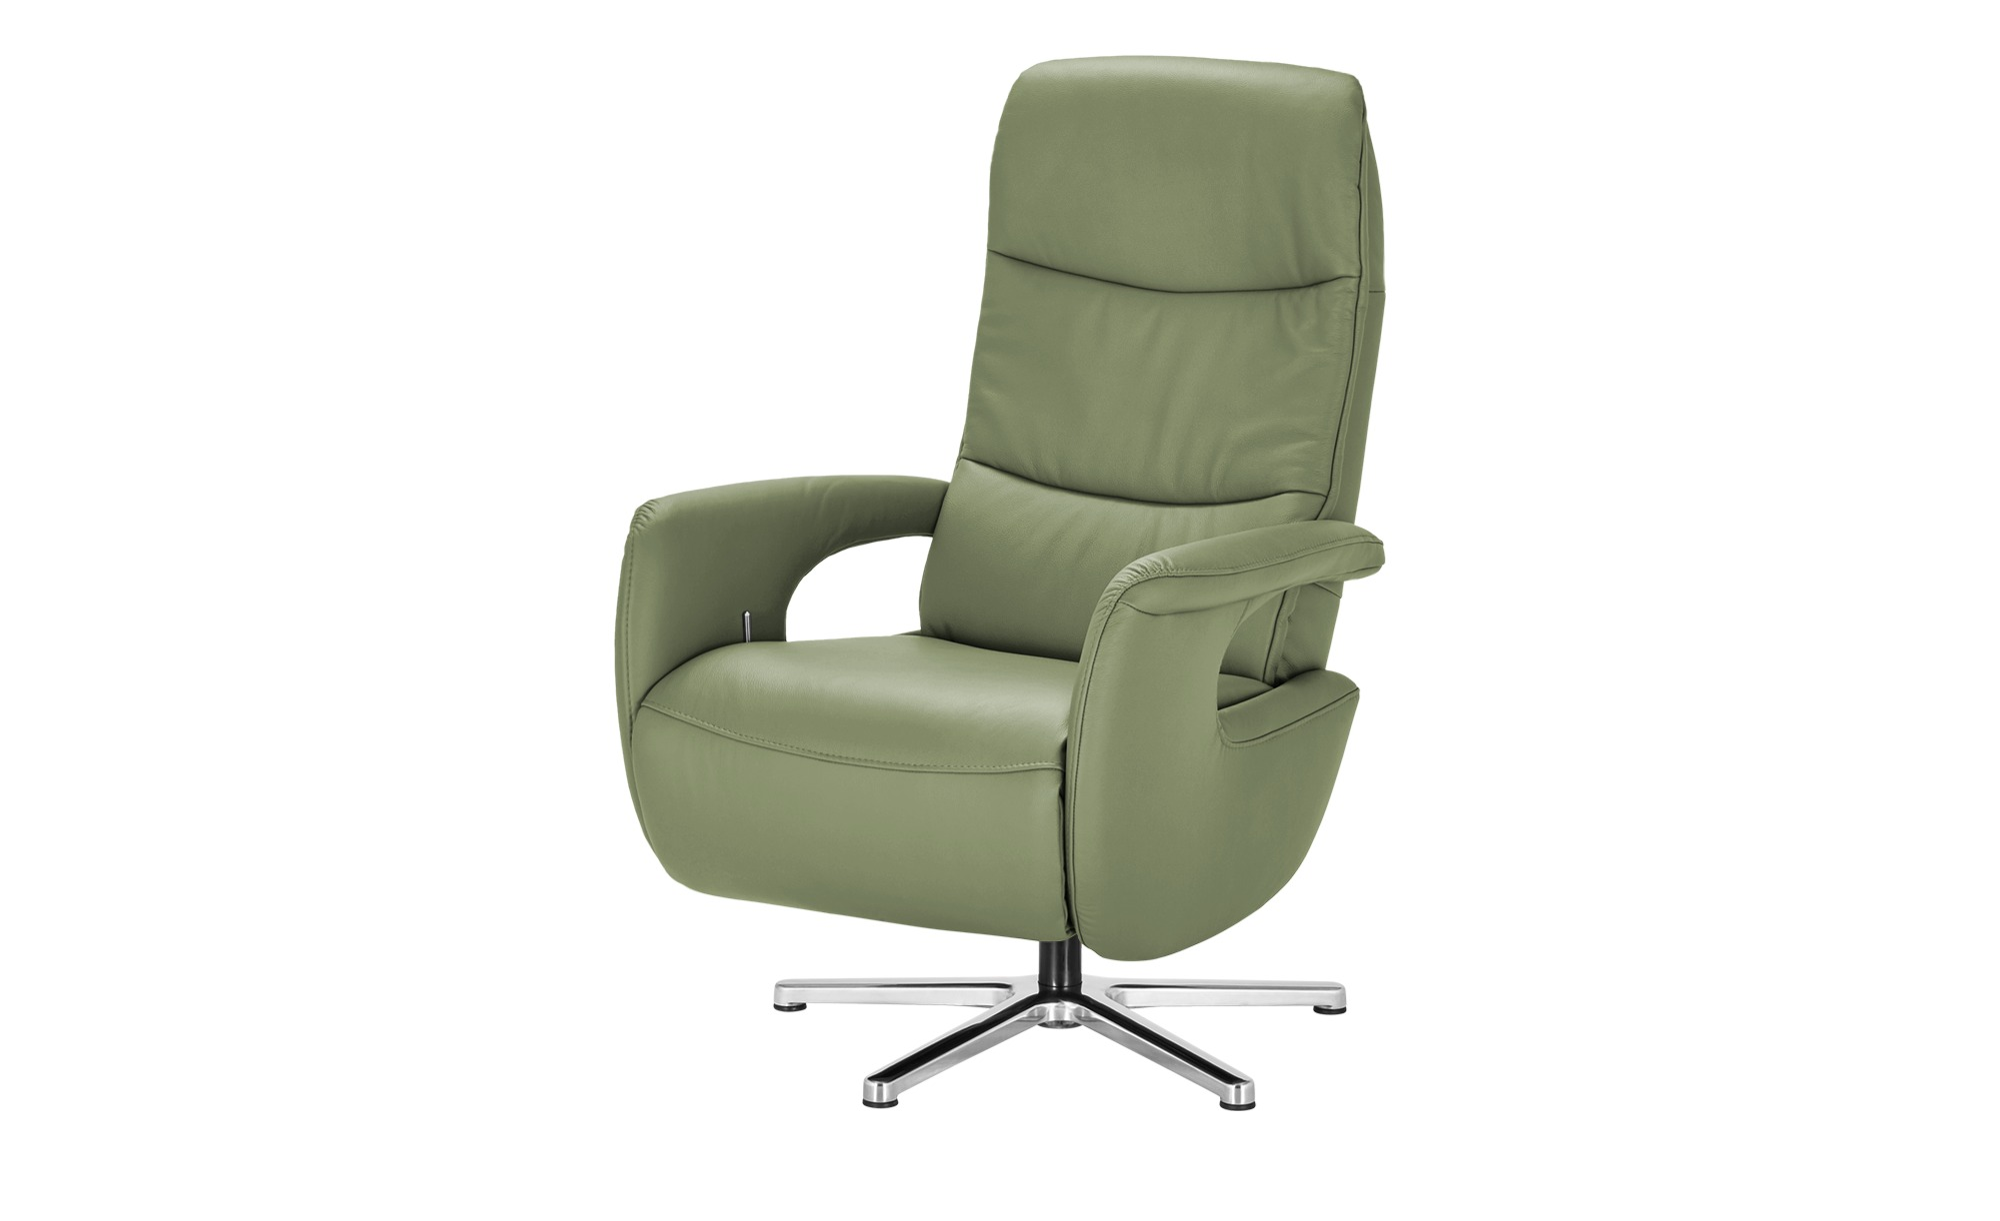 Hukla Relaxsessel  Enno ¦ grün ¦ Maße (cm): B: 72 H: 110 T: 85 Polstermöbel > Sessel > Fernsehsessel - Höffner